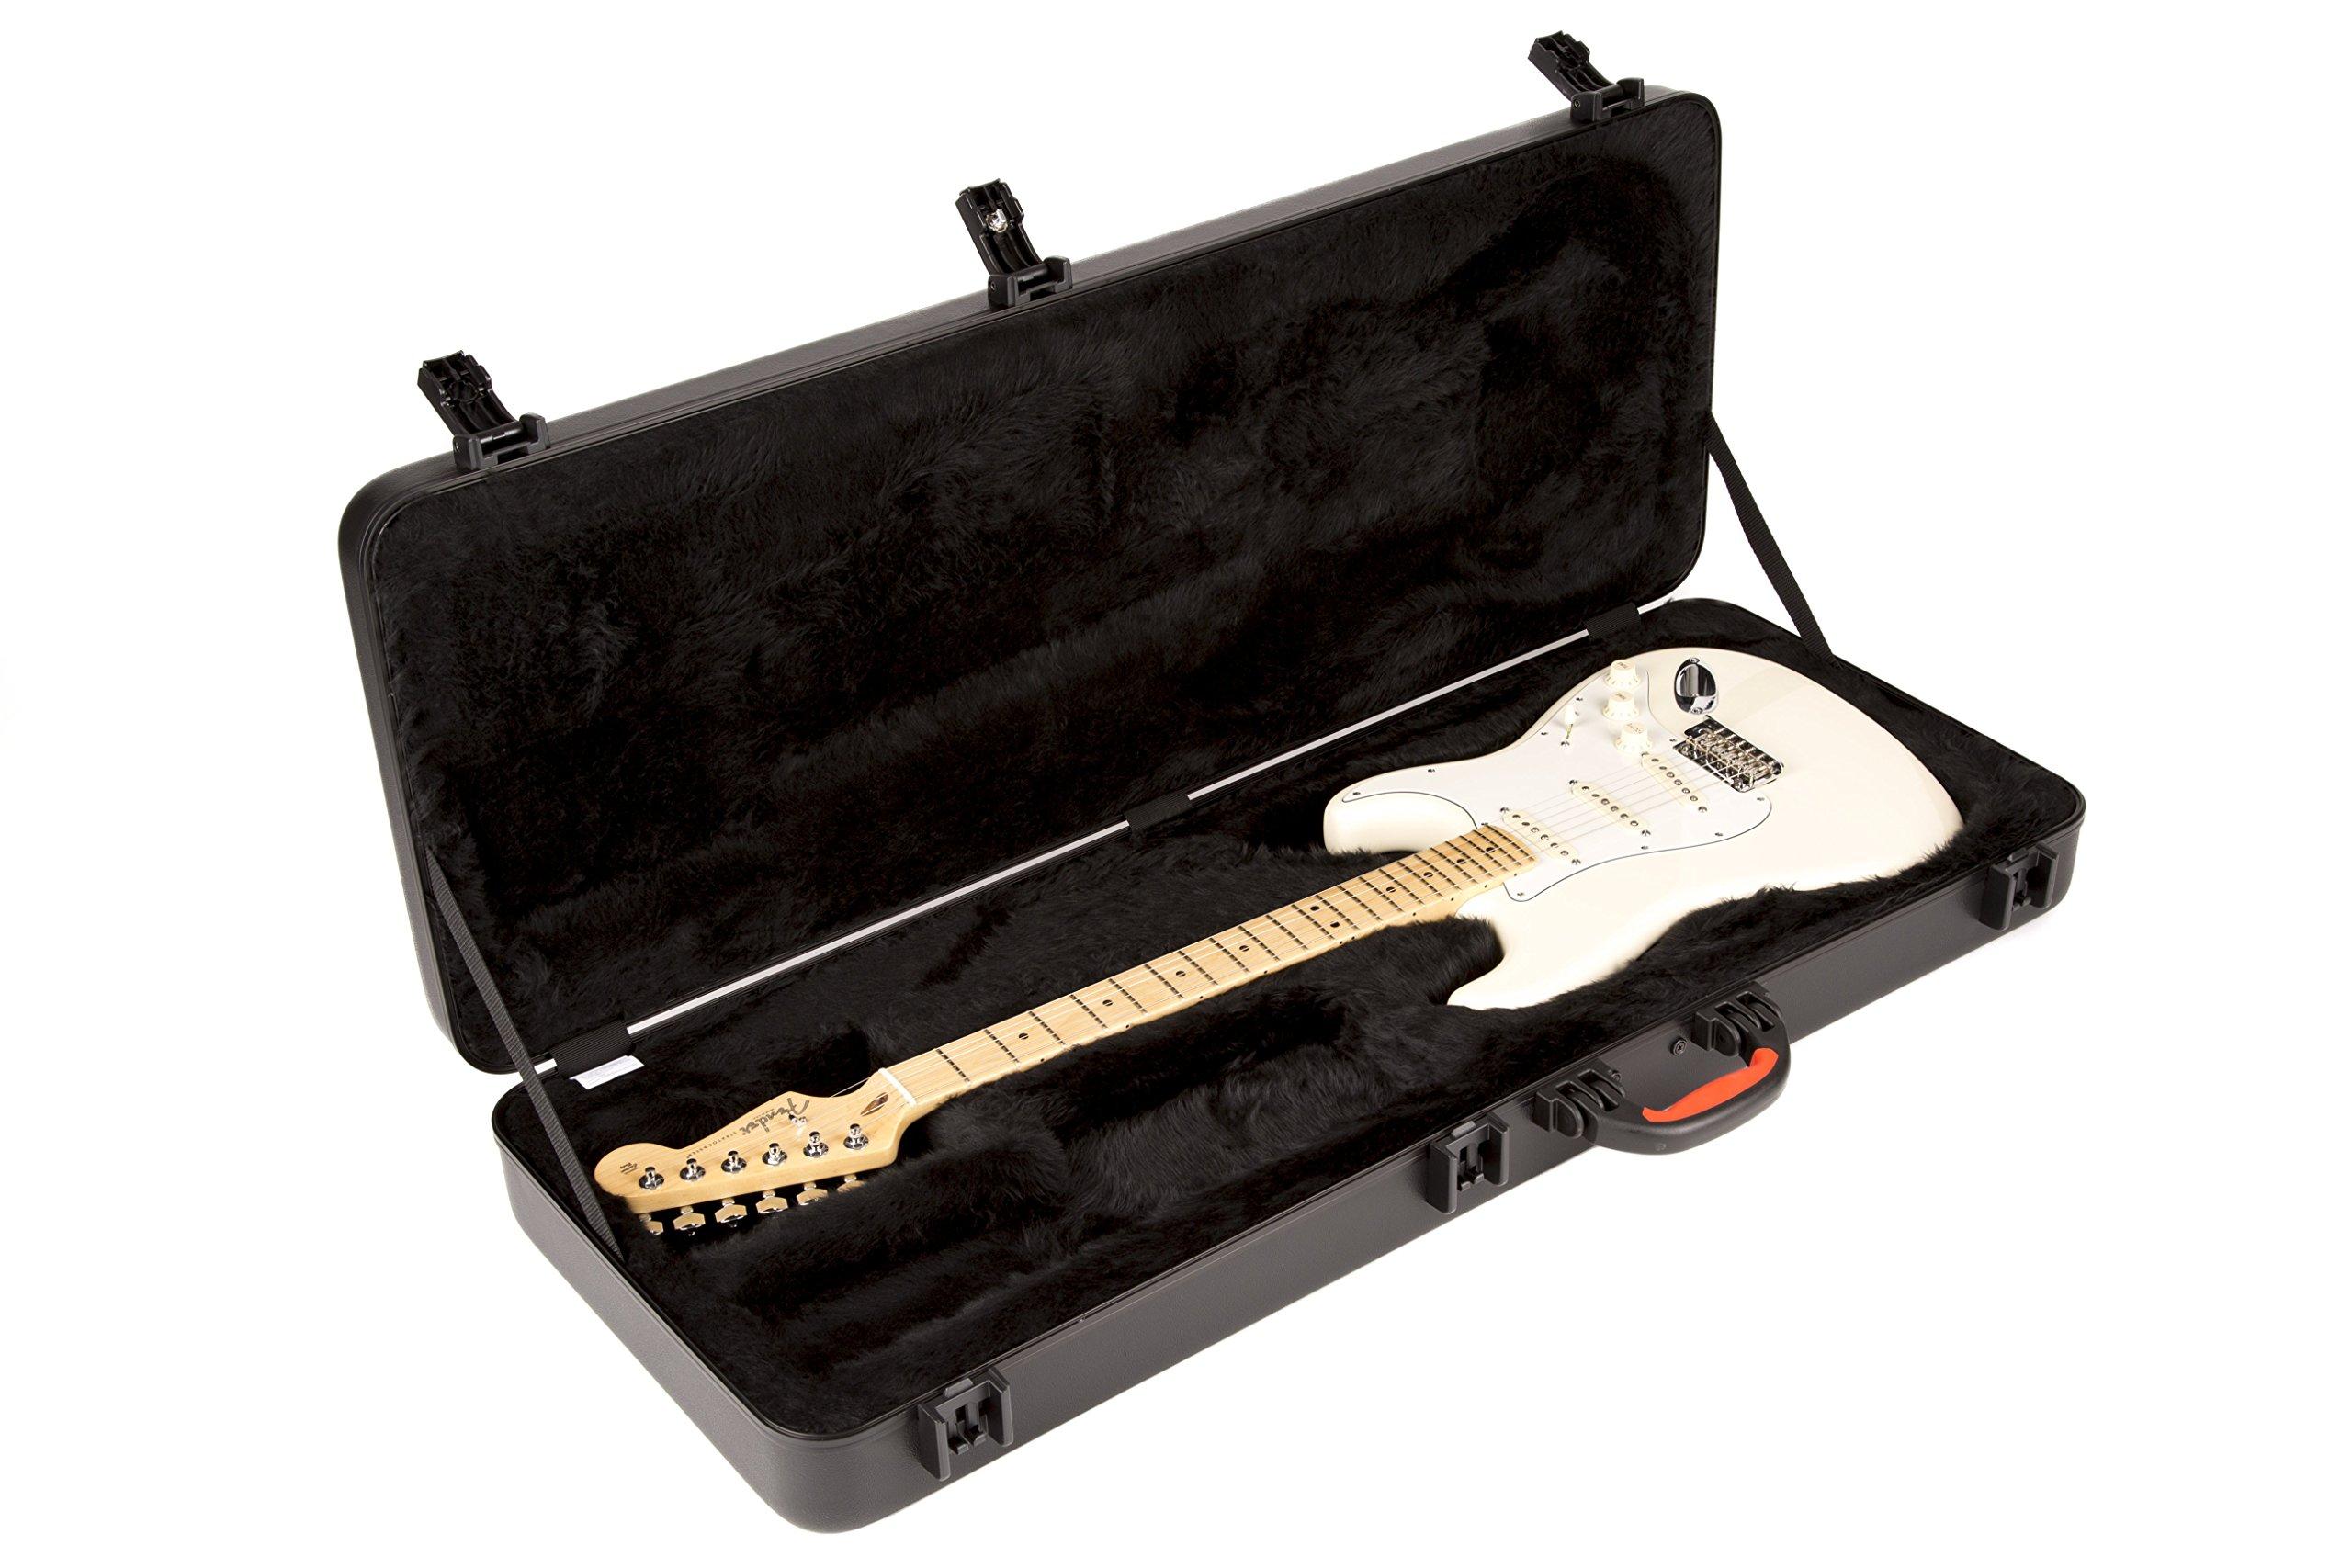 Fender ABS - Funda rígida para guitarra eléctricas (Stratocaster o Telecaster): Amazon.es: Instrumentos musicales